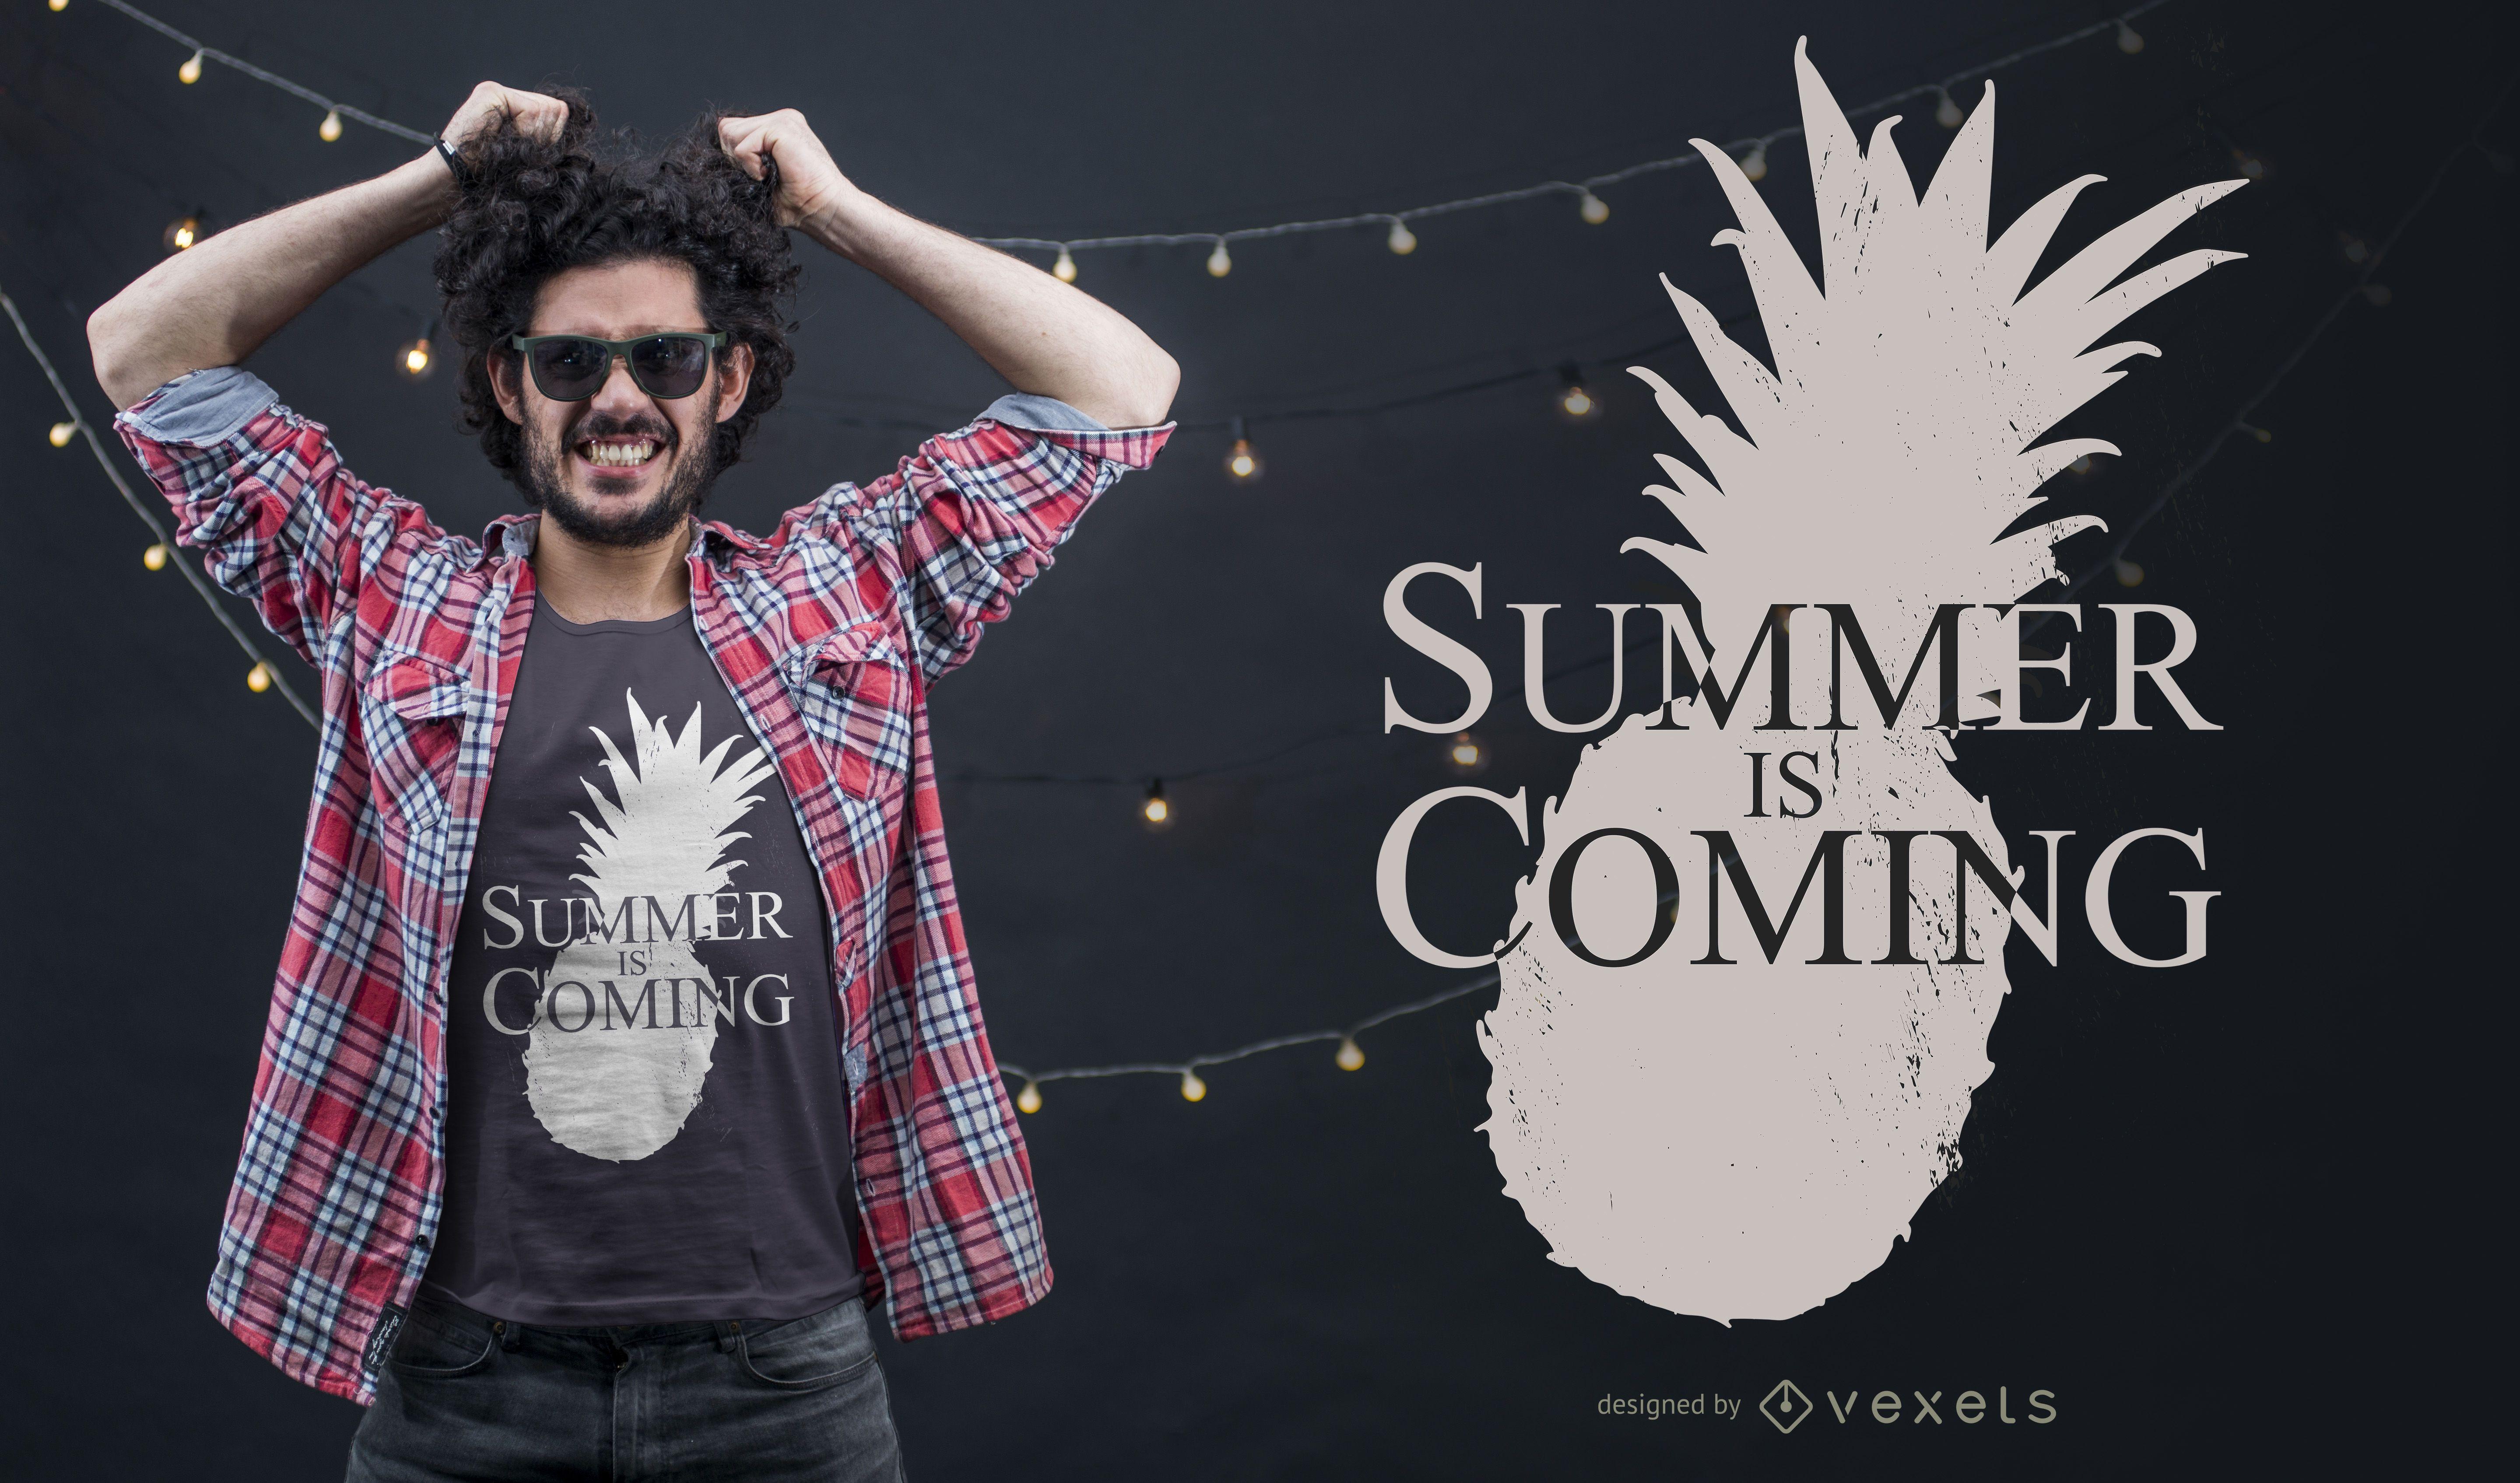 Summer is Coming T-shirt Design